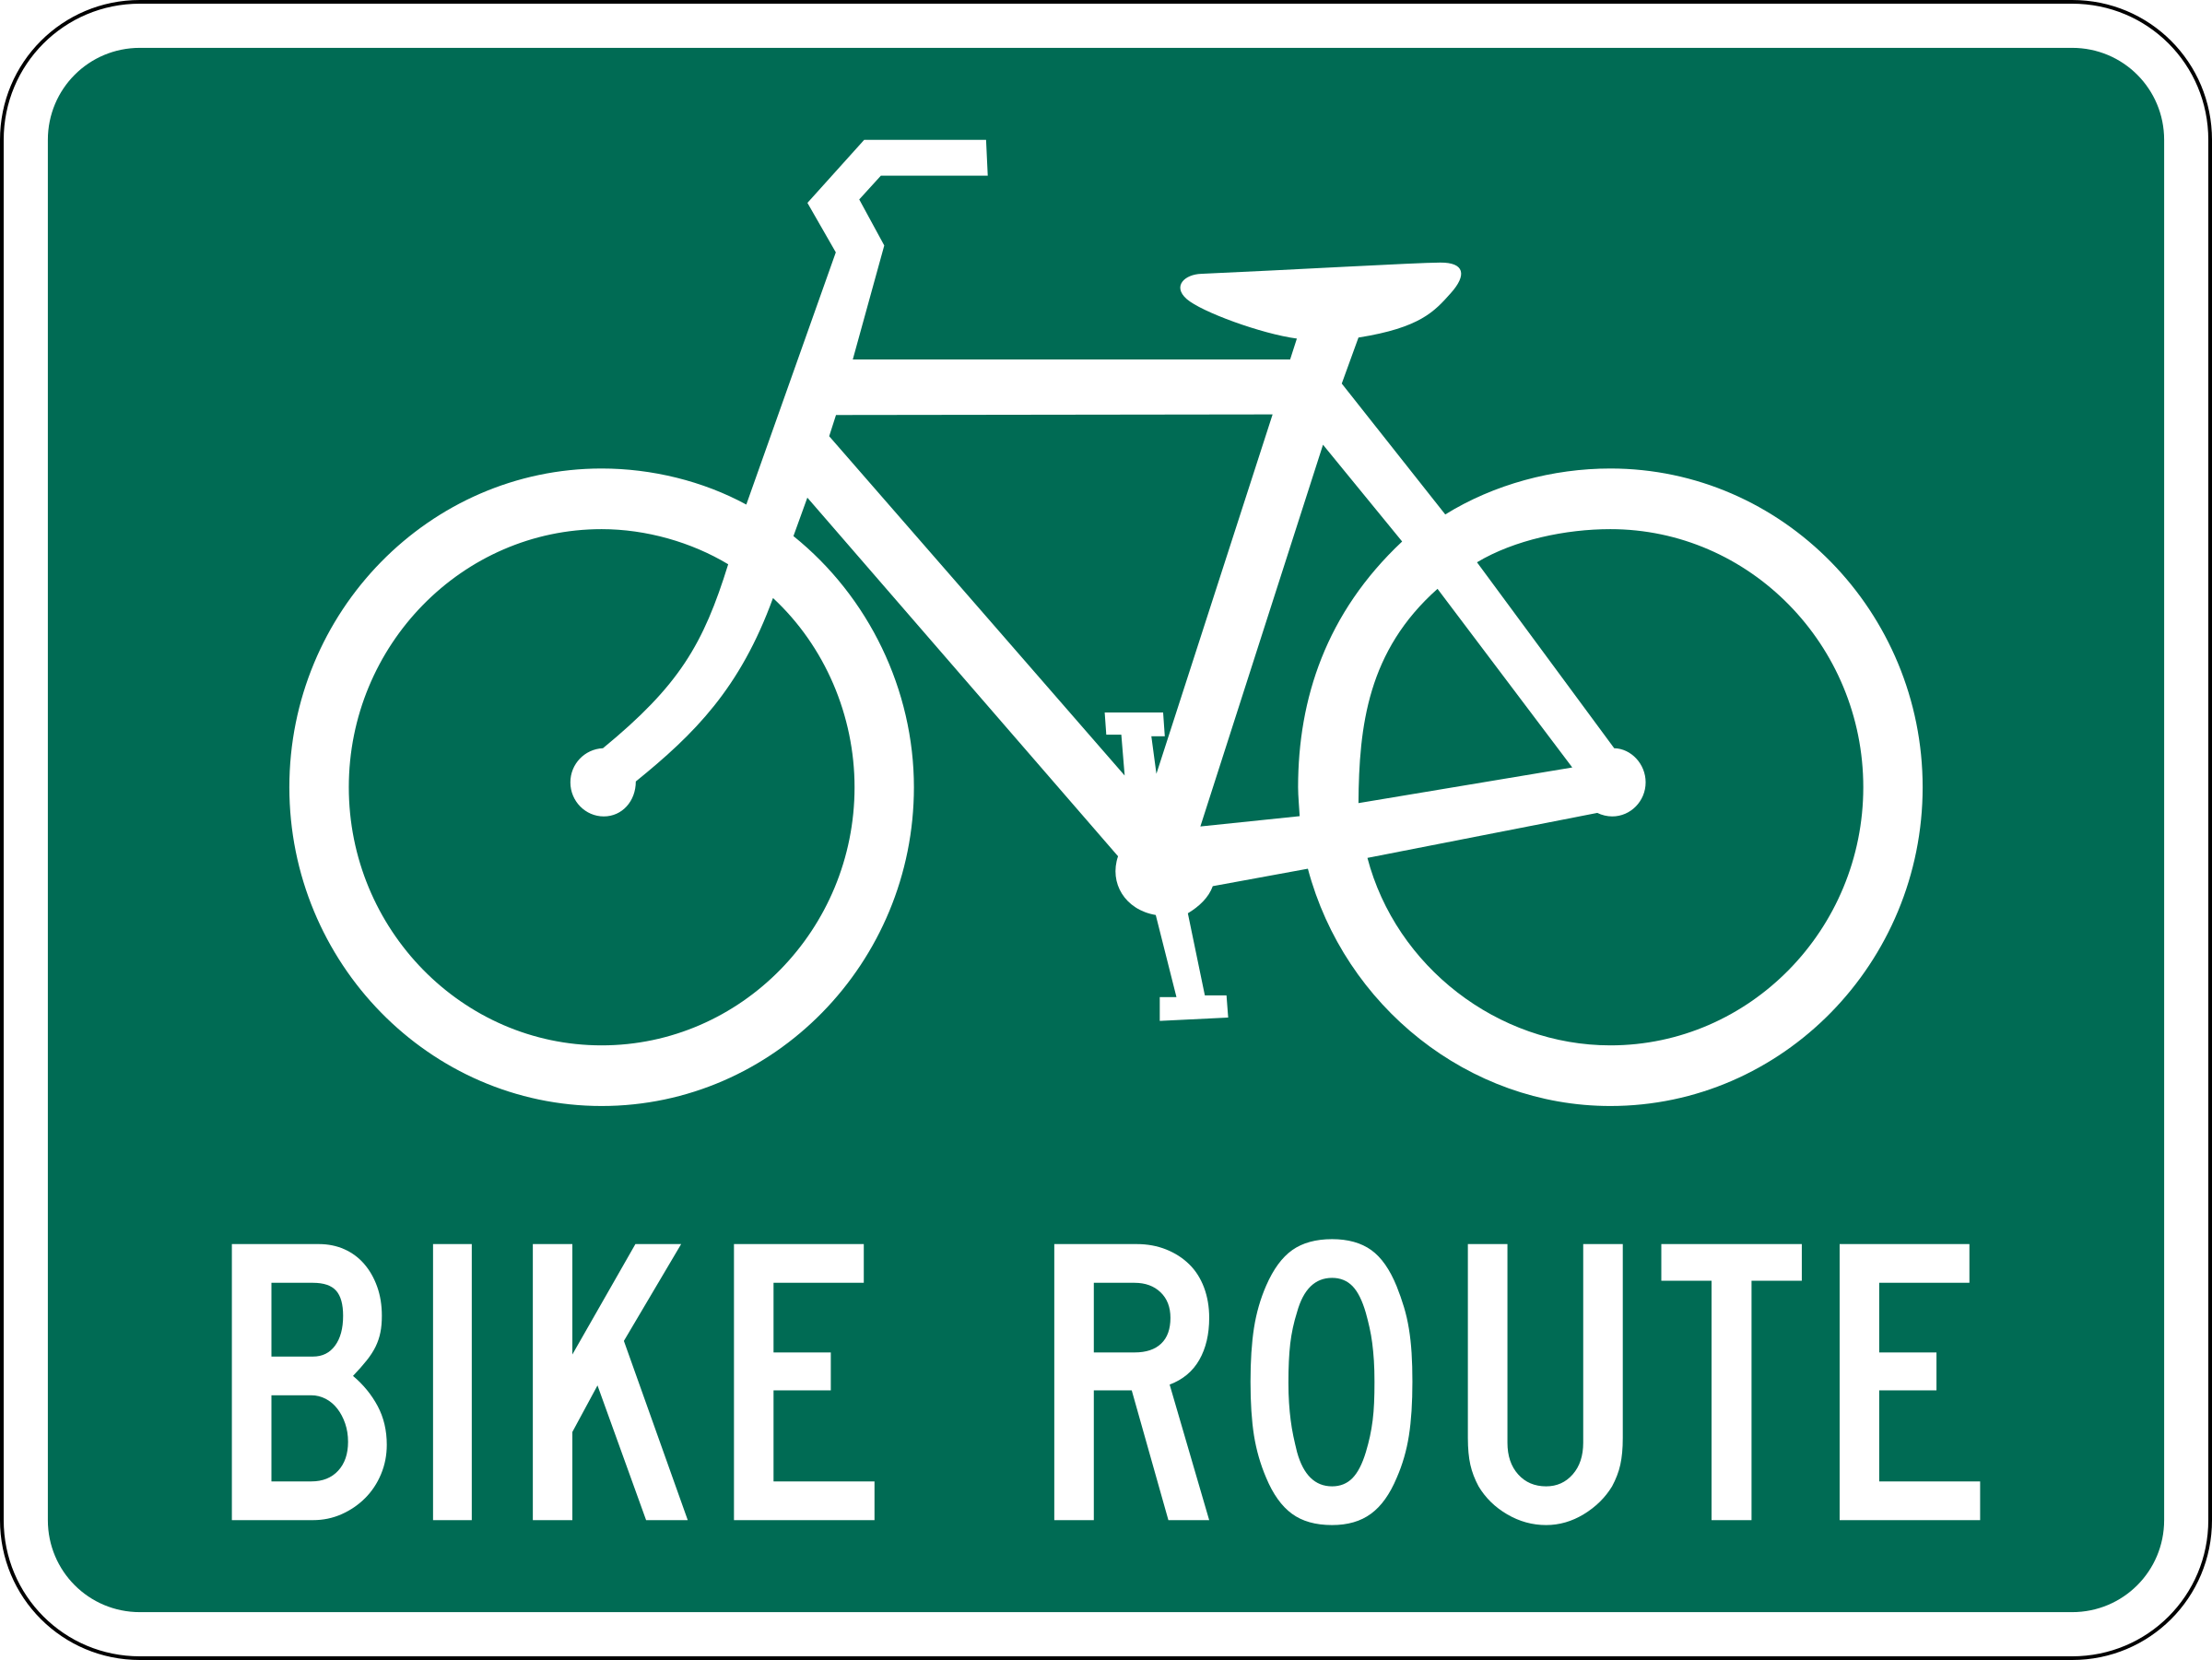 Bike Route Clipart.